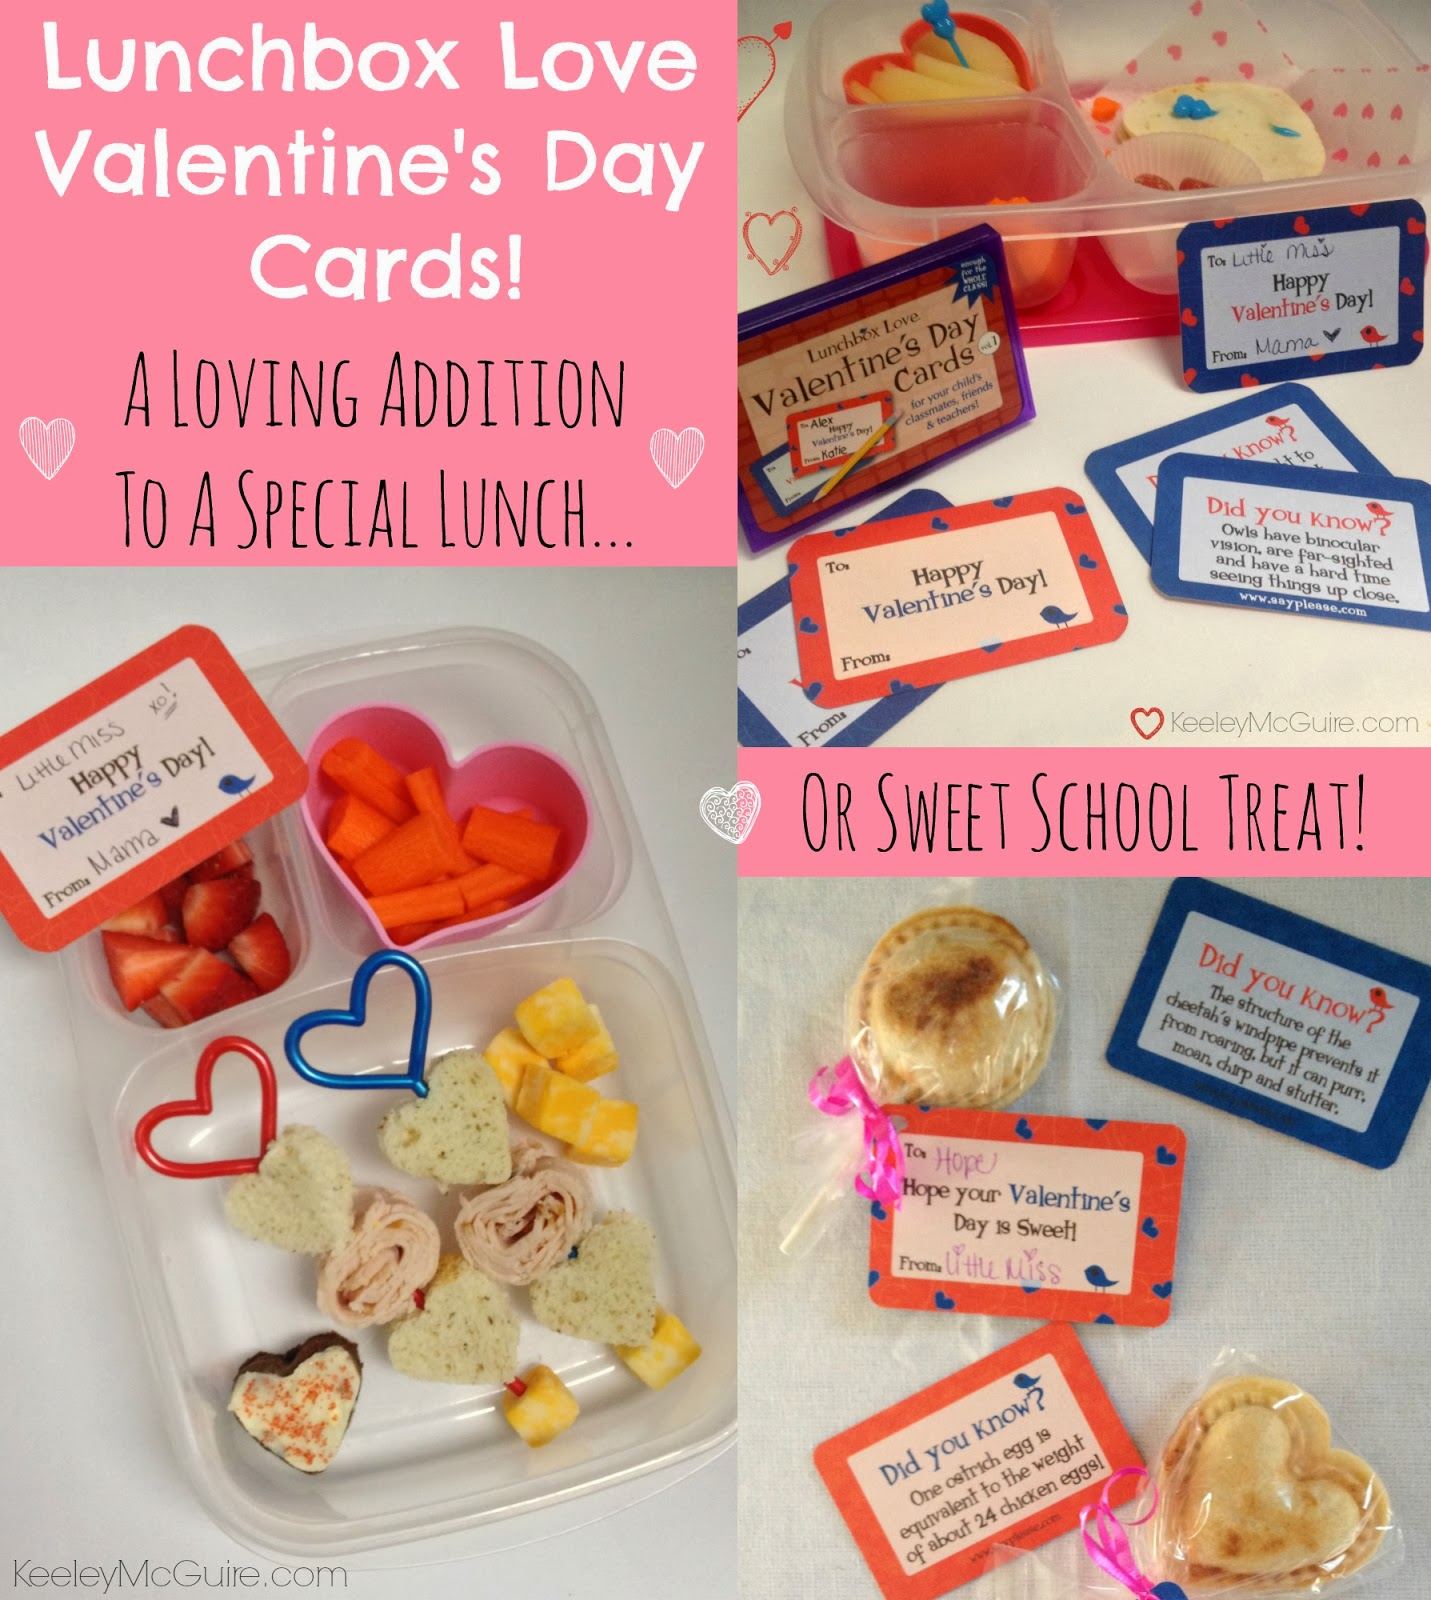 Gluten Free Allergy Friendly Lunchbox Love Valentines Day – Valentines Cards for School